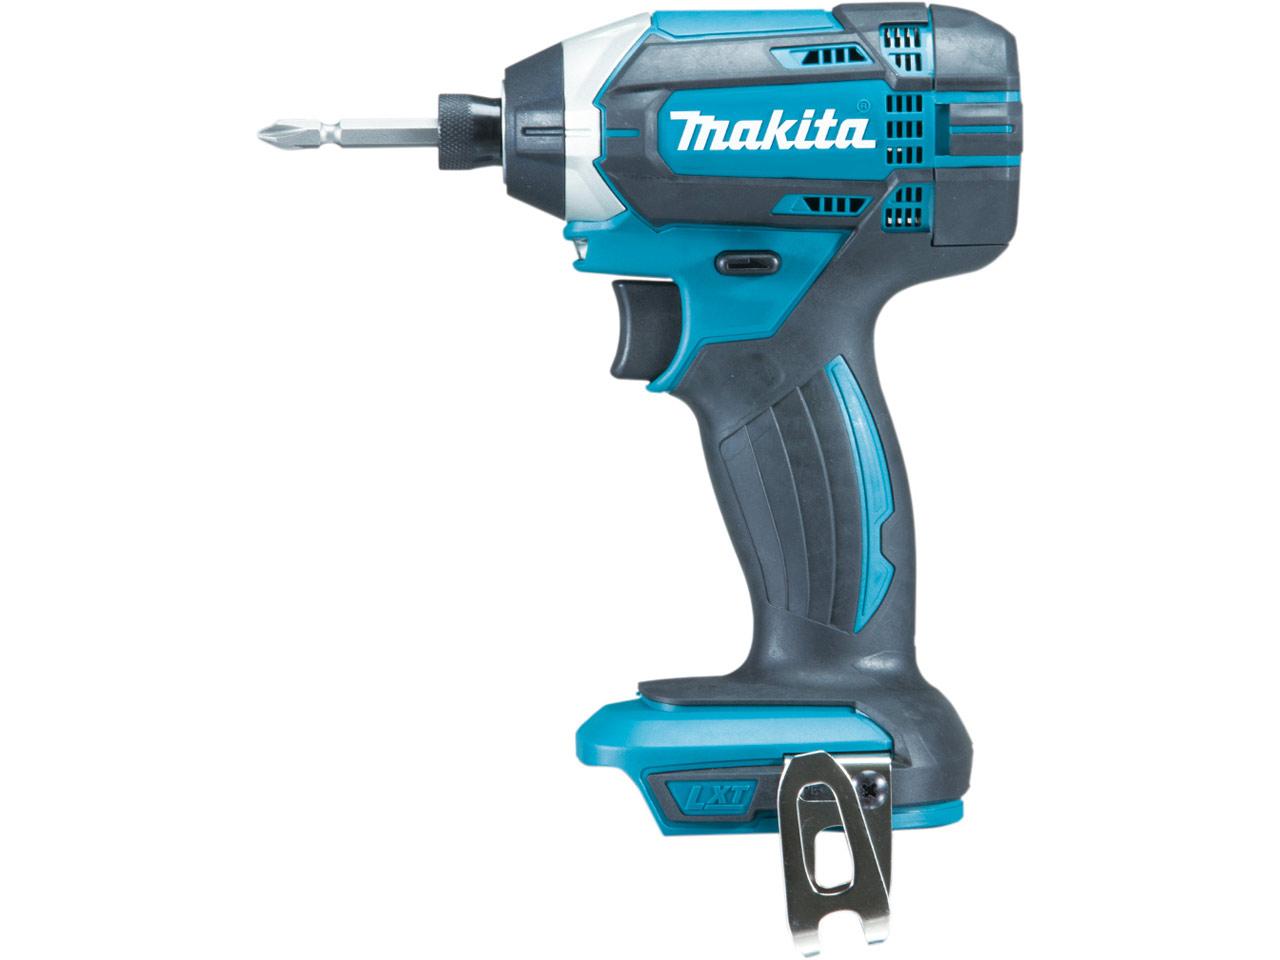 Makita DTD152Z 18V LXT Impact Cordless Battery Driver Bare Unit £49.95 at FFX